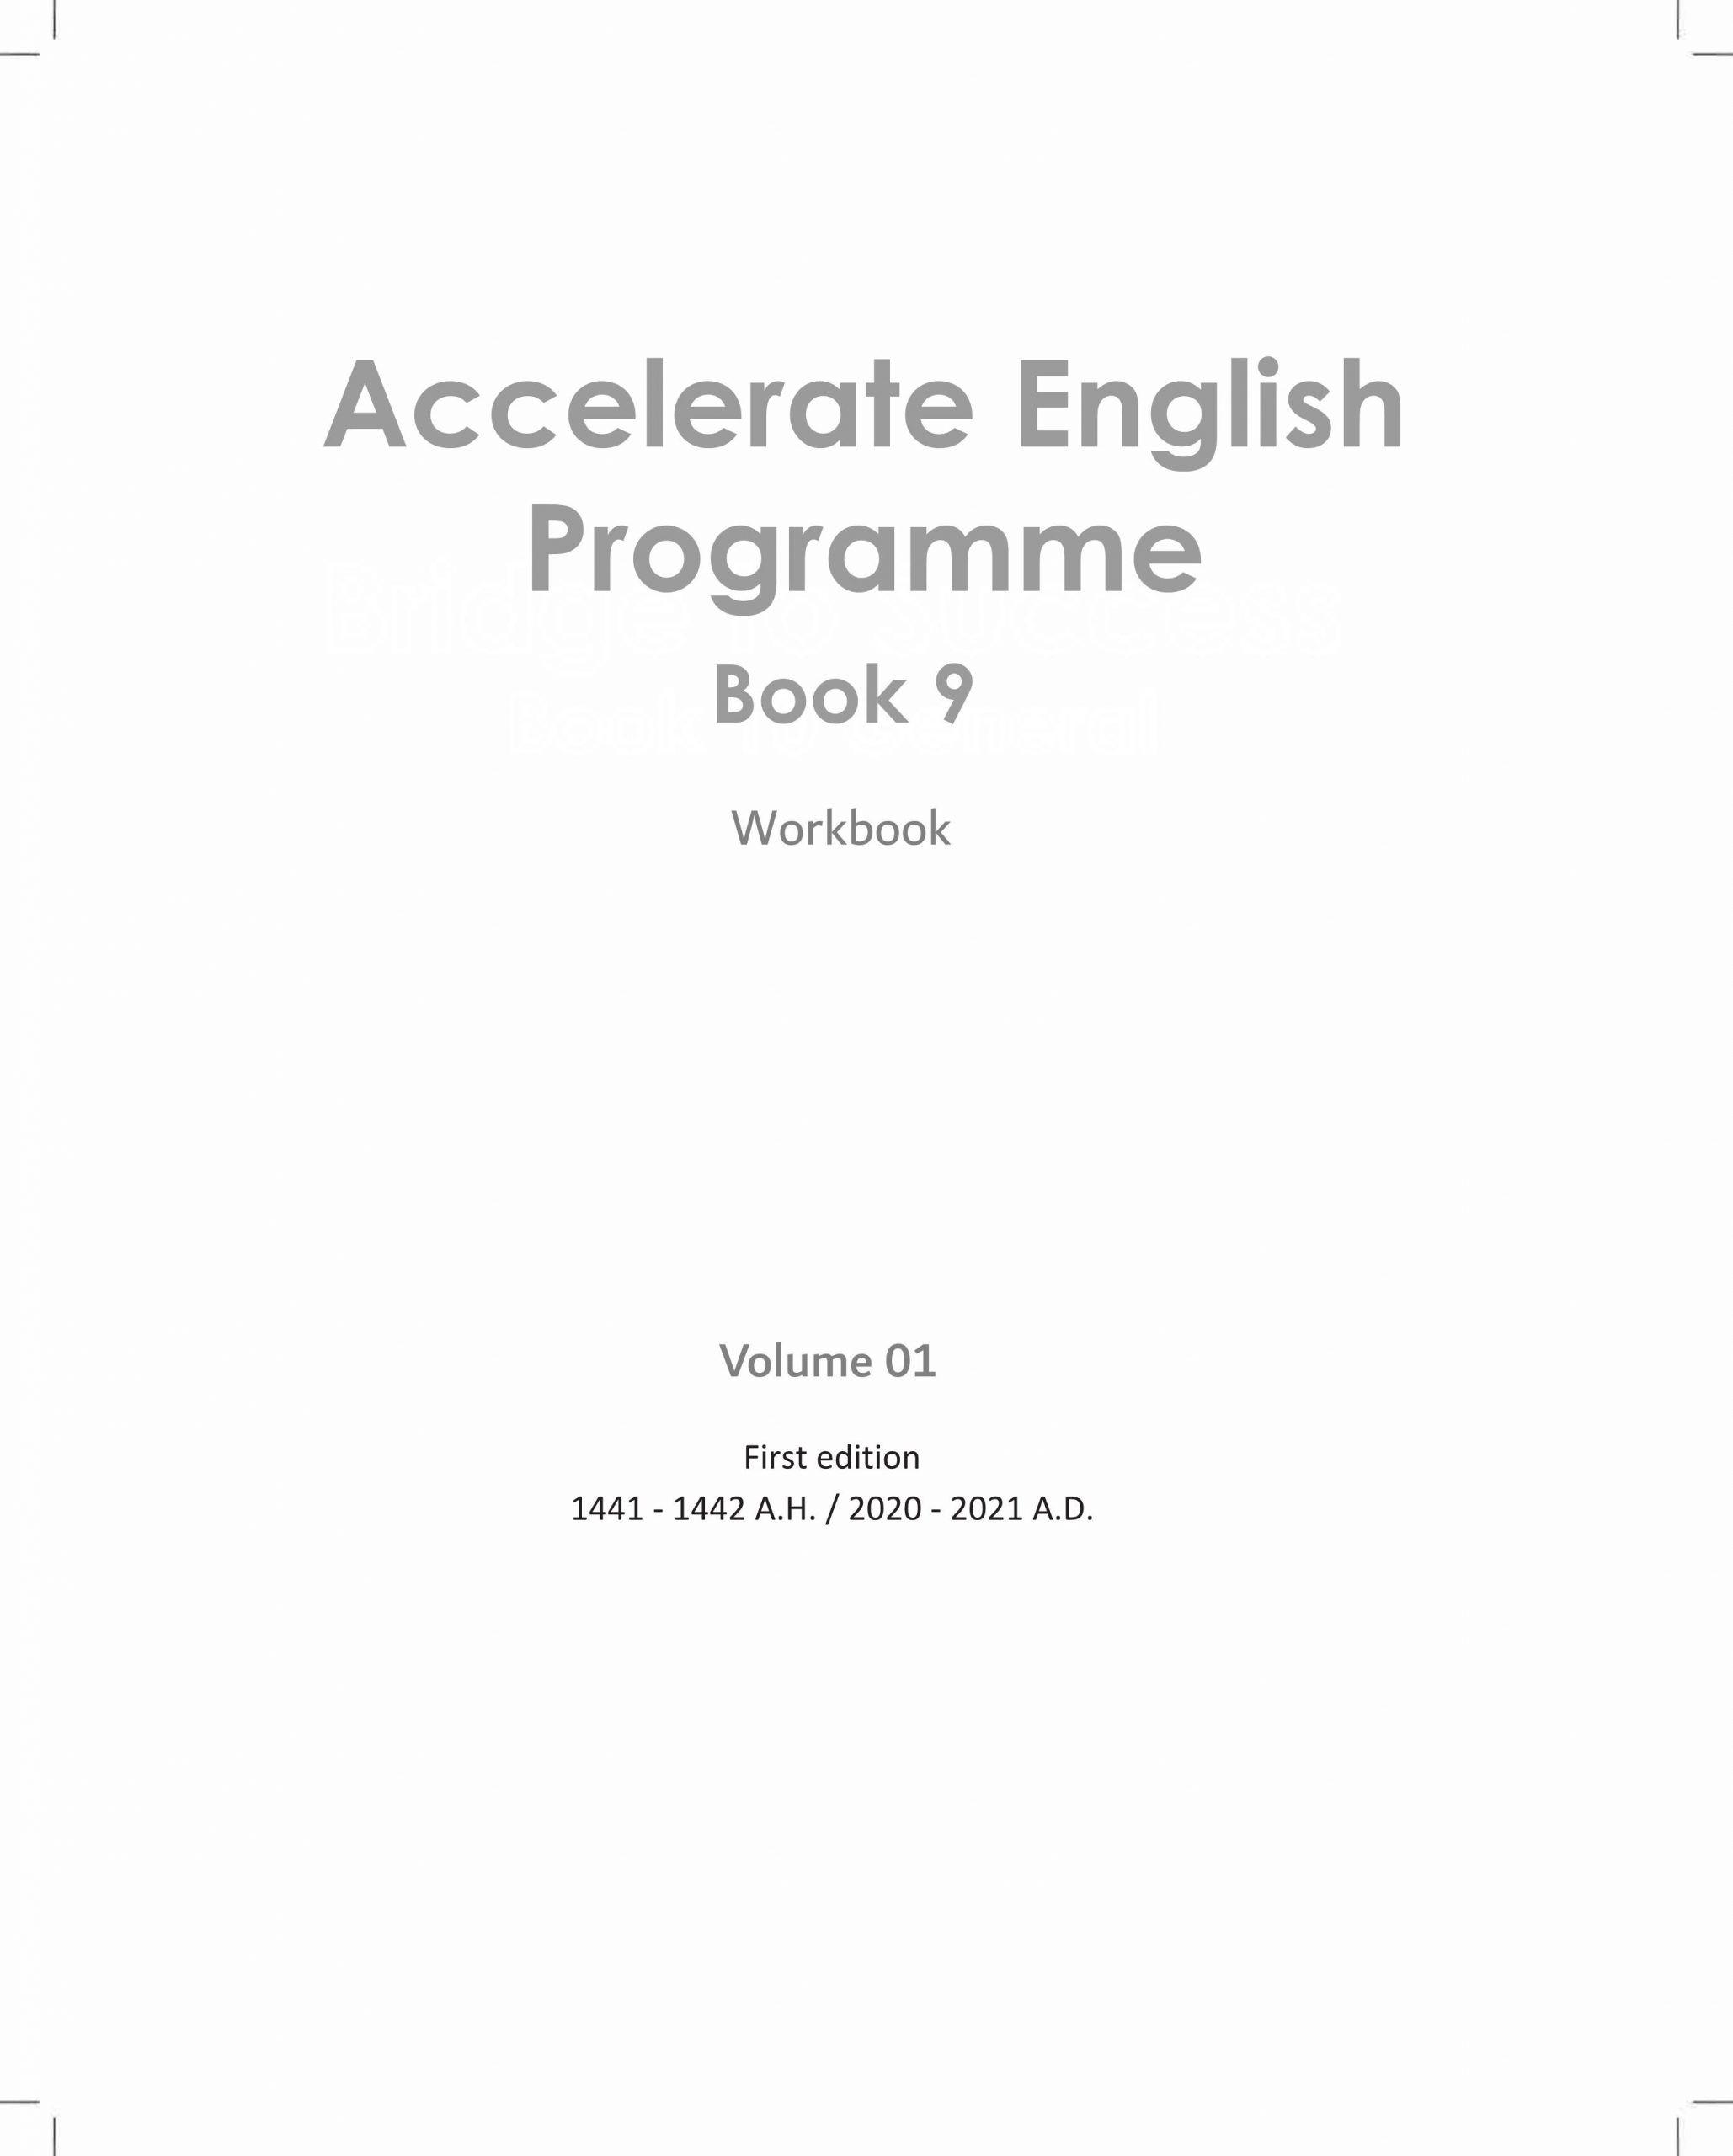 Accelerate English Programmer كتاب النشاط 2020 2021 الصف التاسع مادة اللغة الانجليزية Workbook Books Acceleration